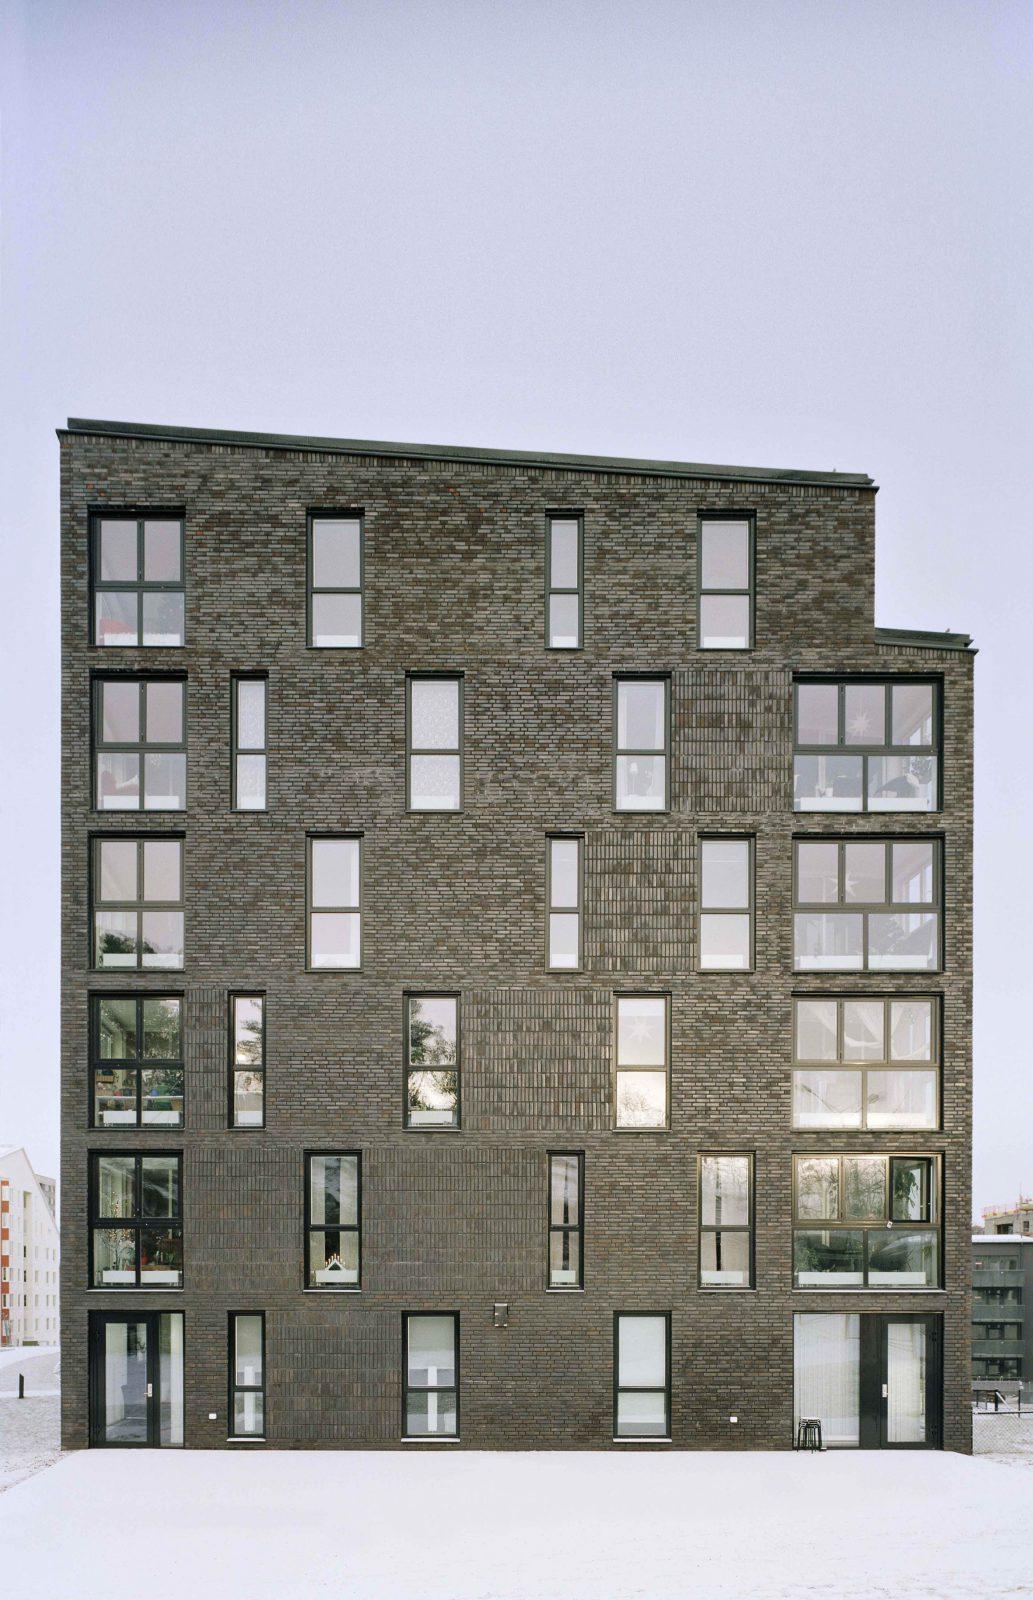 KjellanderSjoberg Annedalsterrassen facade